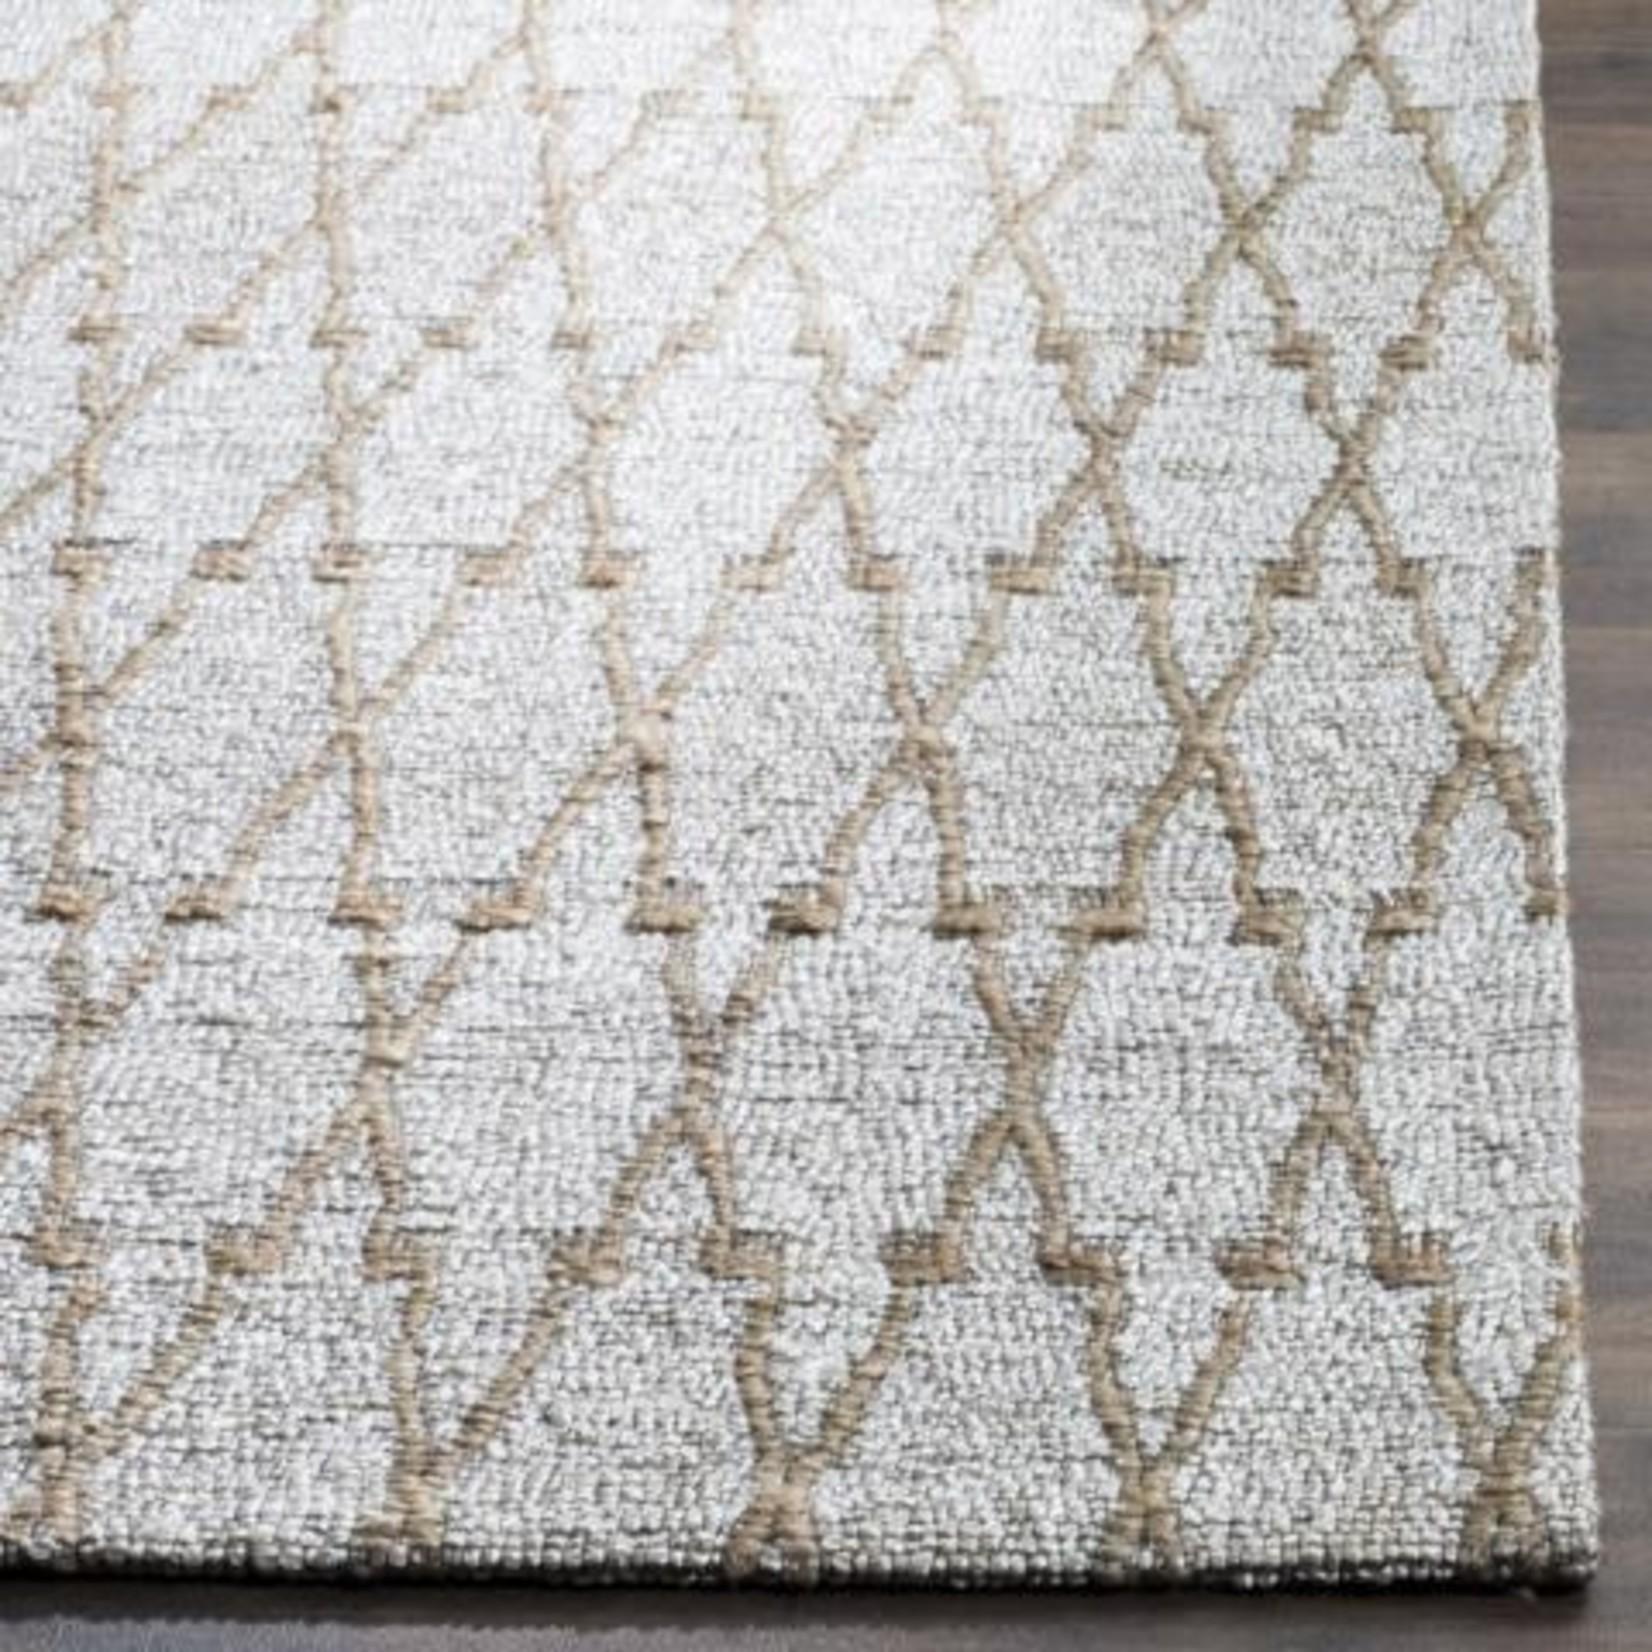 *4' x 6' - Snavely Geometric Handmade Flatweave Silver/Natural Area rug